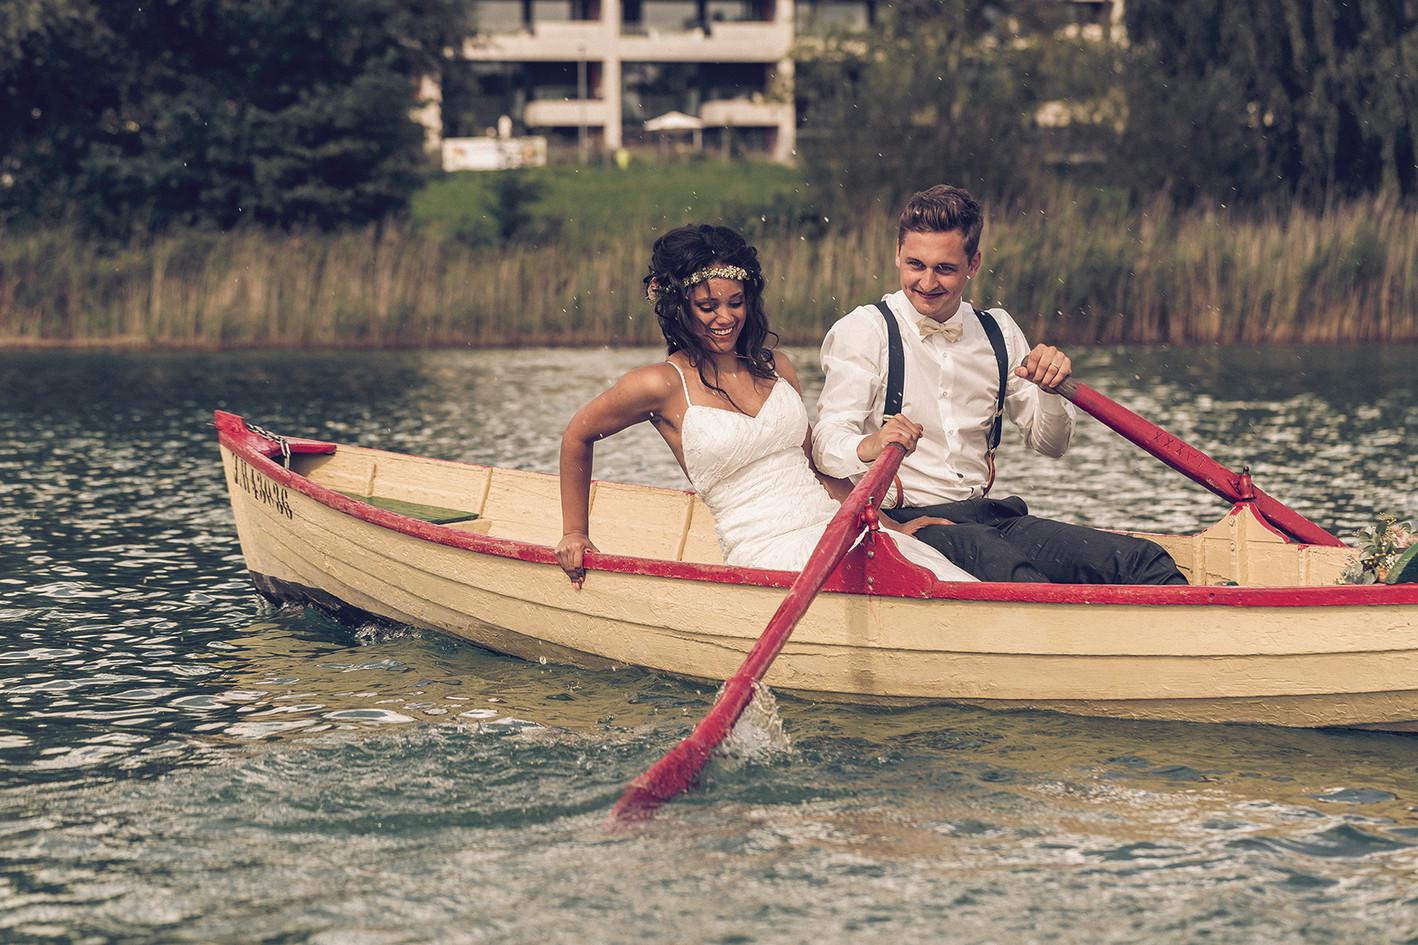 089-married-united-wedding-suephotoart-p